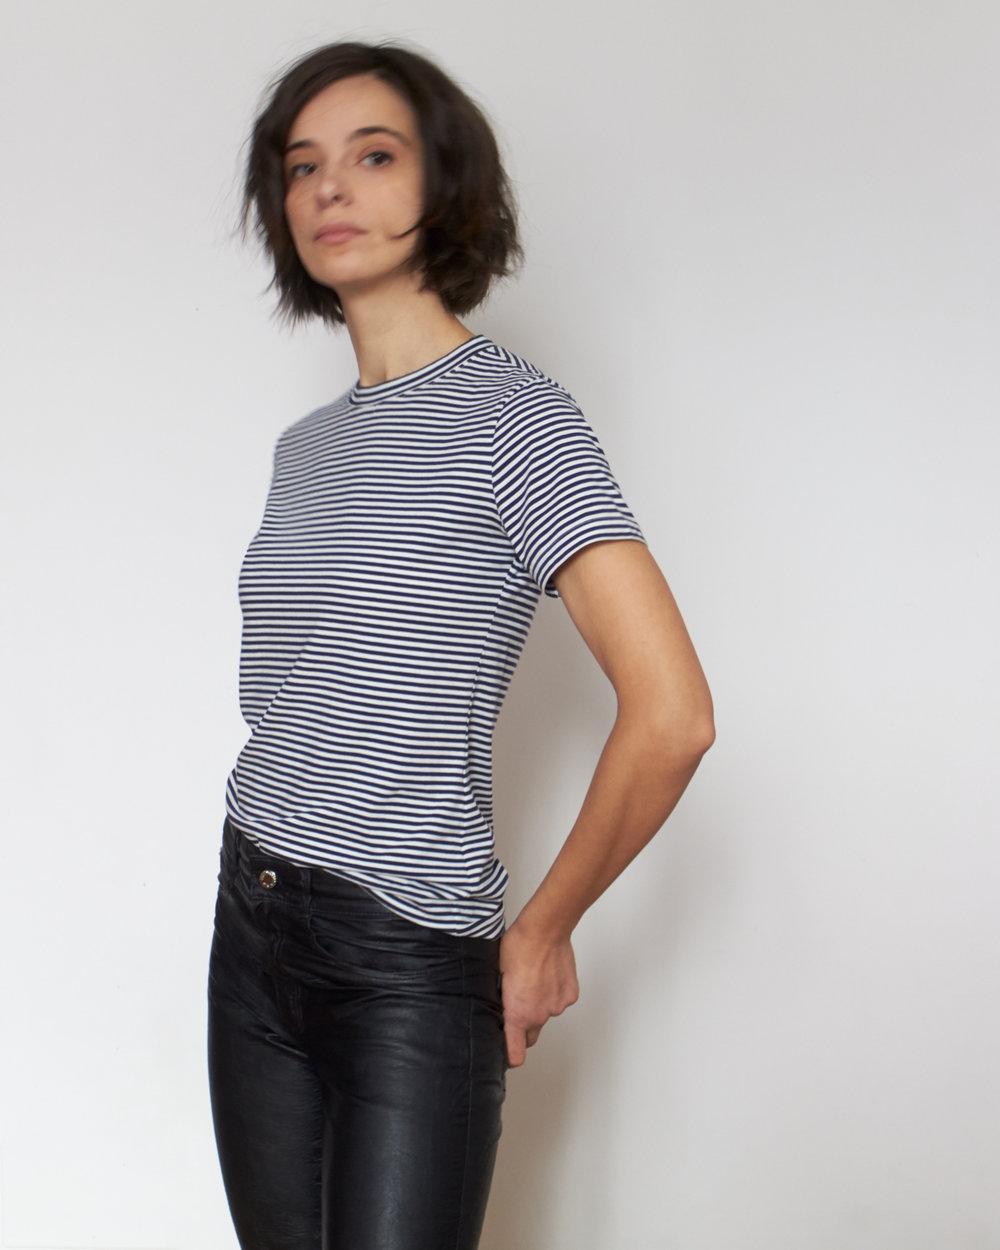 Lebenskleidung stretch GOTS cotton jersey